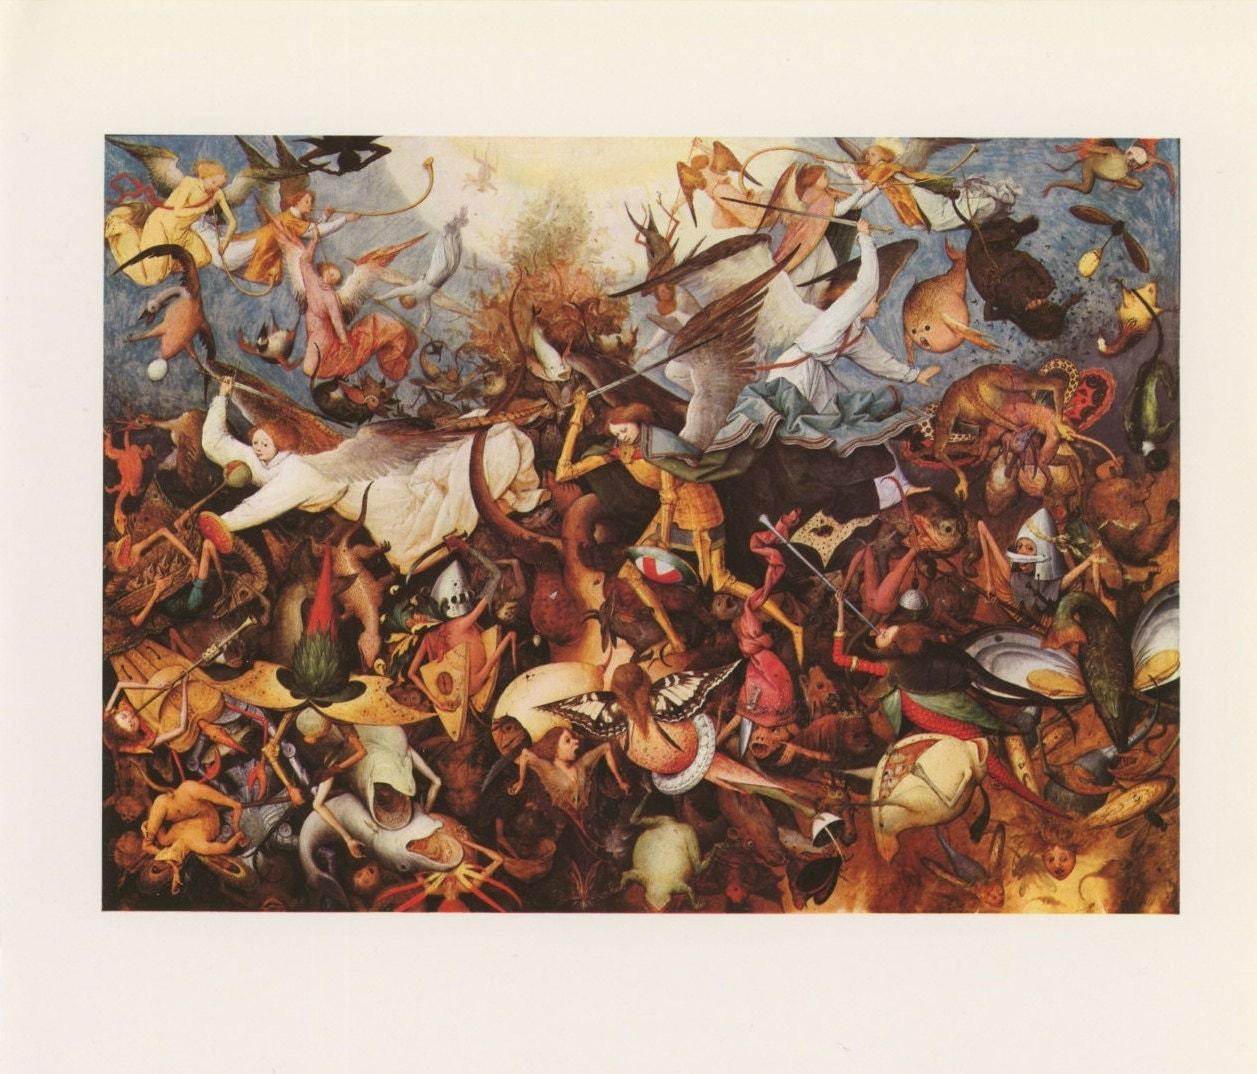 Vs Demons Battle   Angels Vs Demons War   Angels Demons PaintingAngels Demons Painting